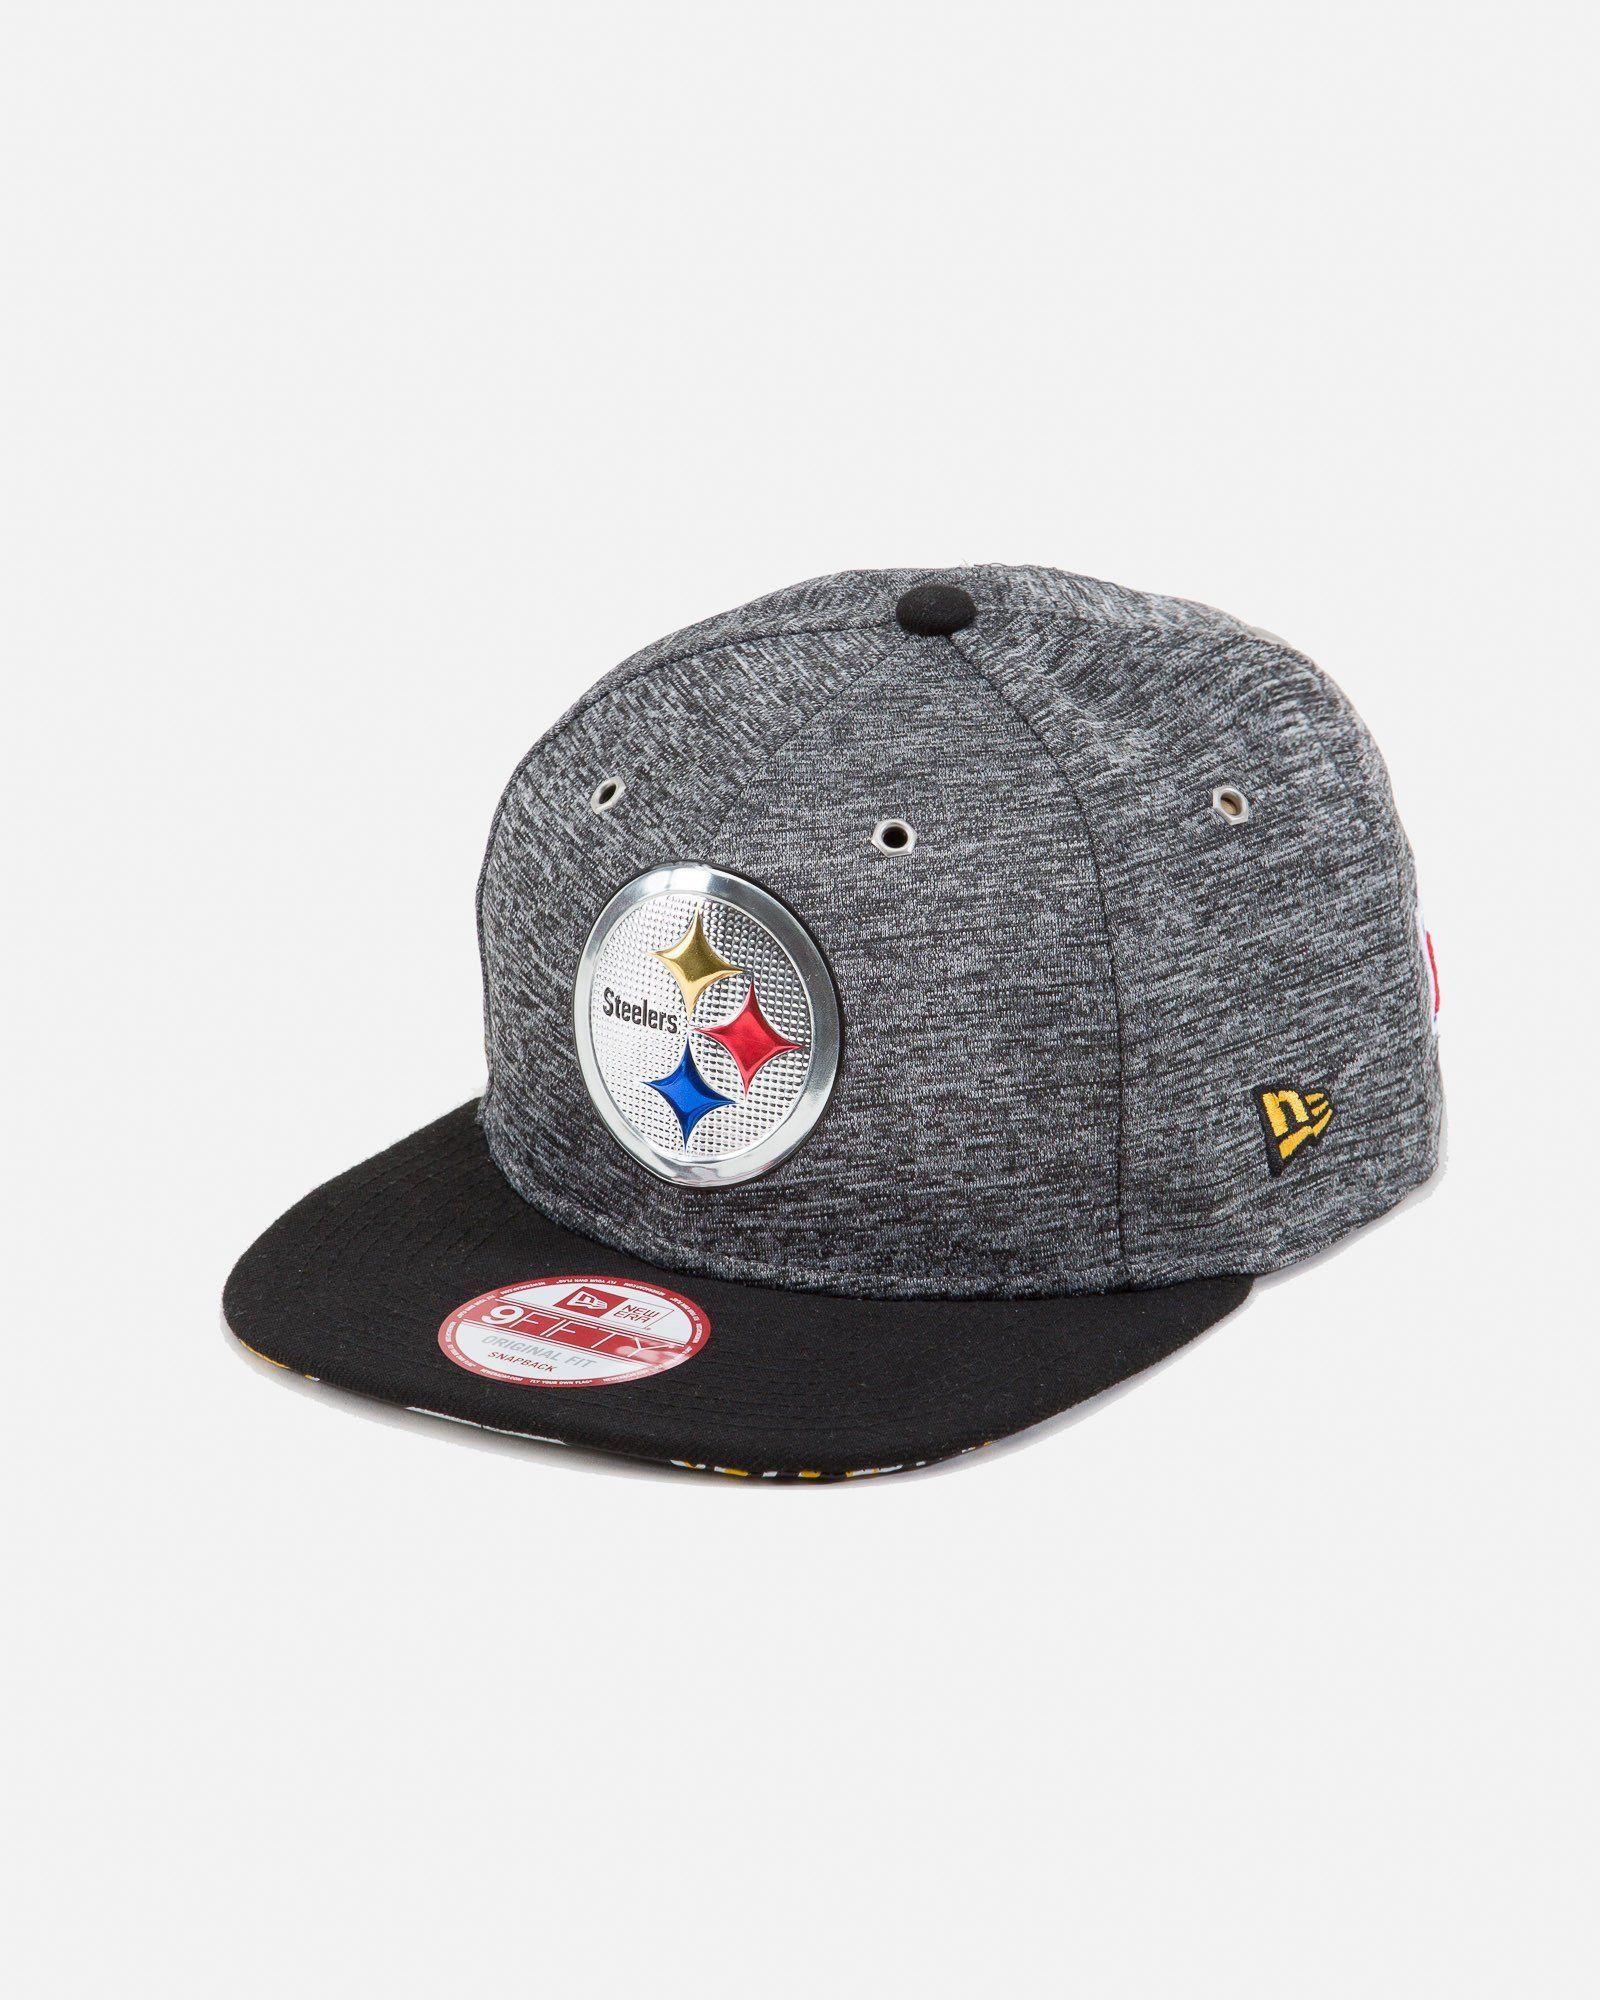 Pittsburgh Steelers 9FIFTY Snapback Hat Grey Black  f4f22dc1c